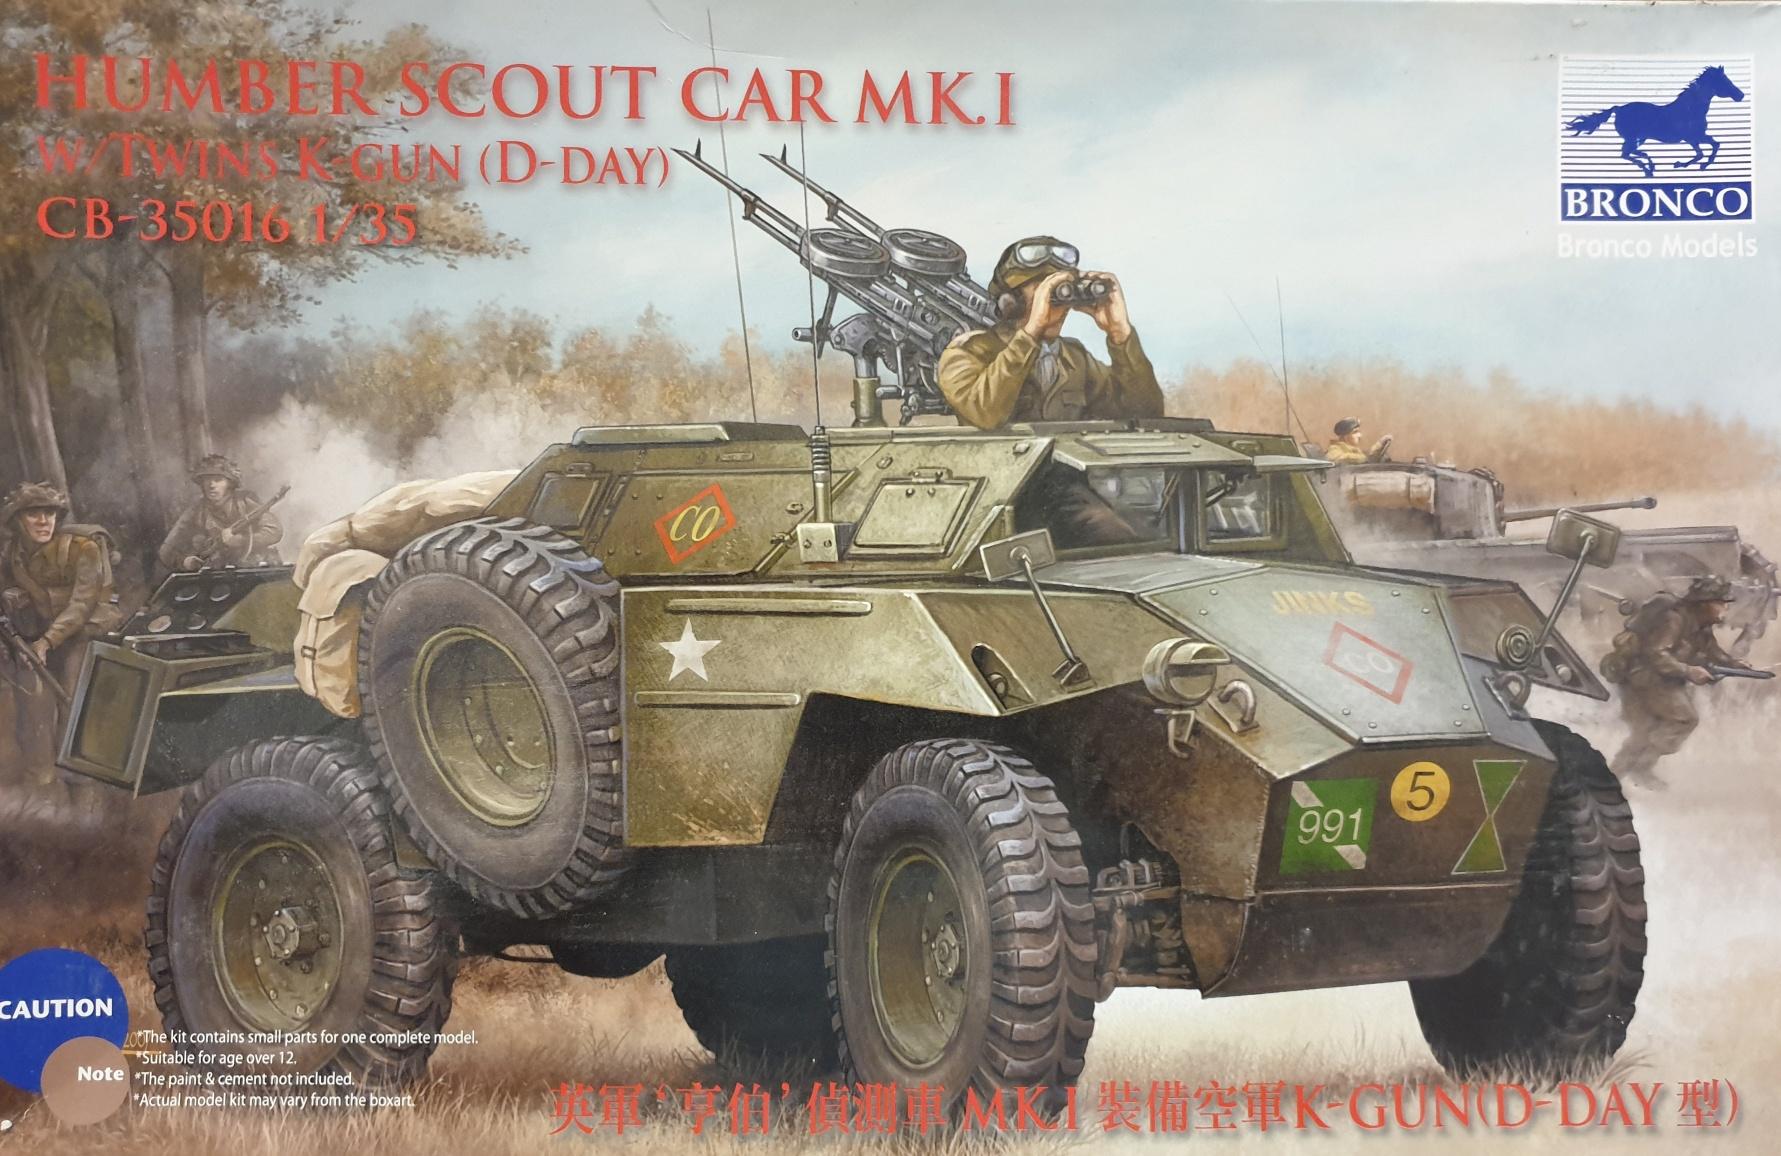 Bronco CB-35016 Humber Scout Car MKI w/ Twins K-Gun (D-Day)